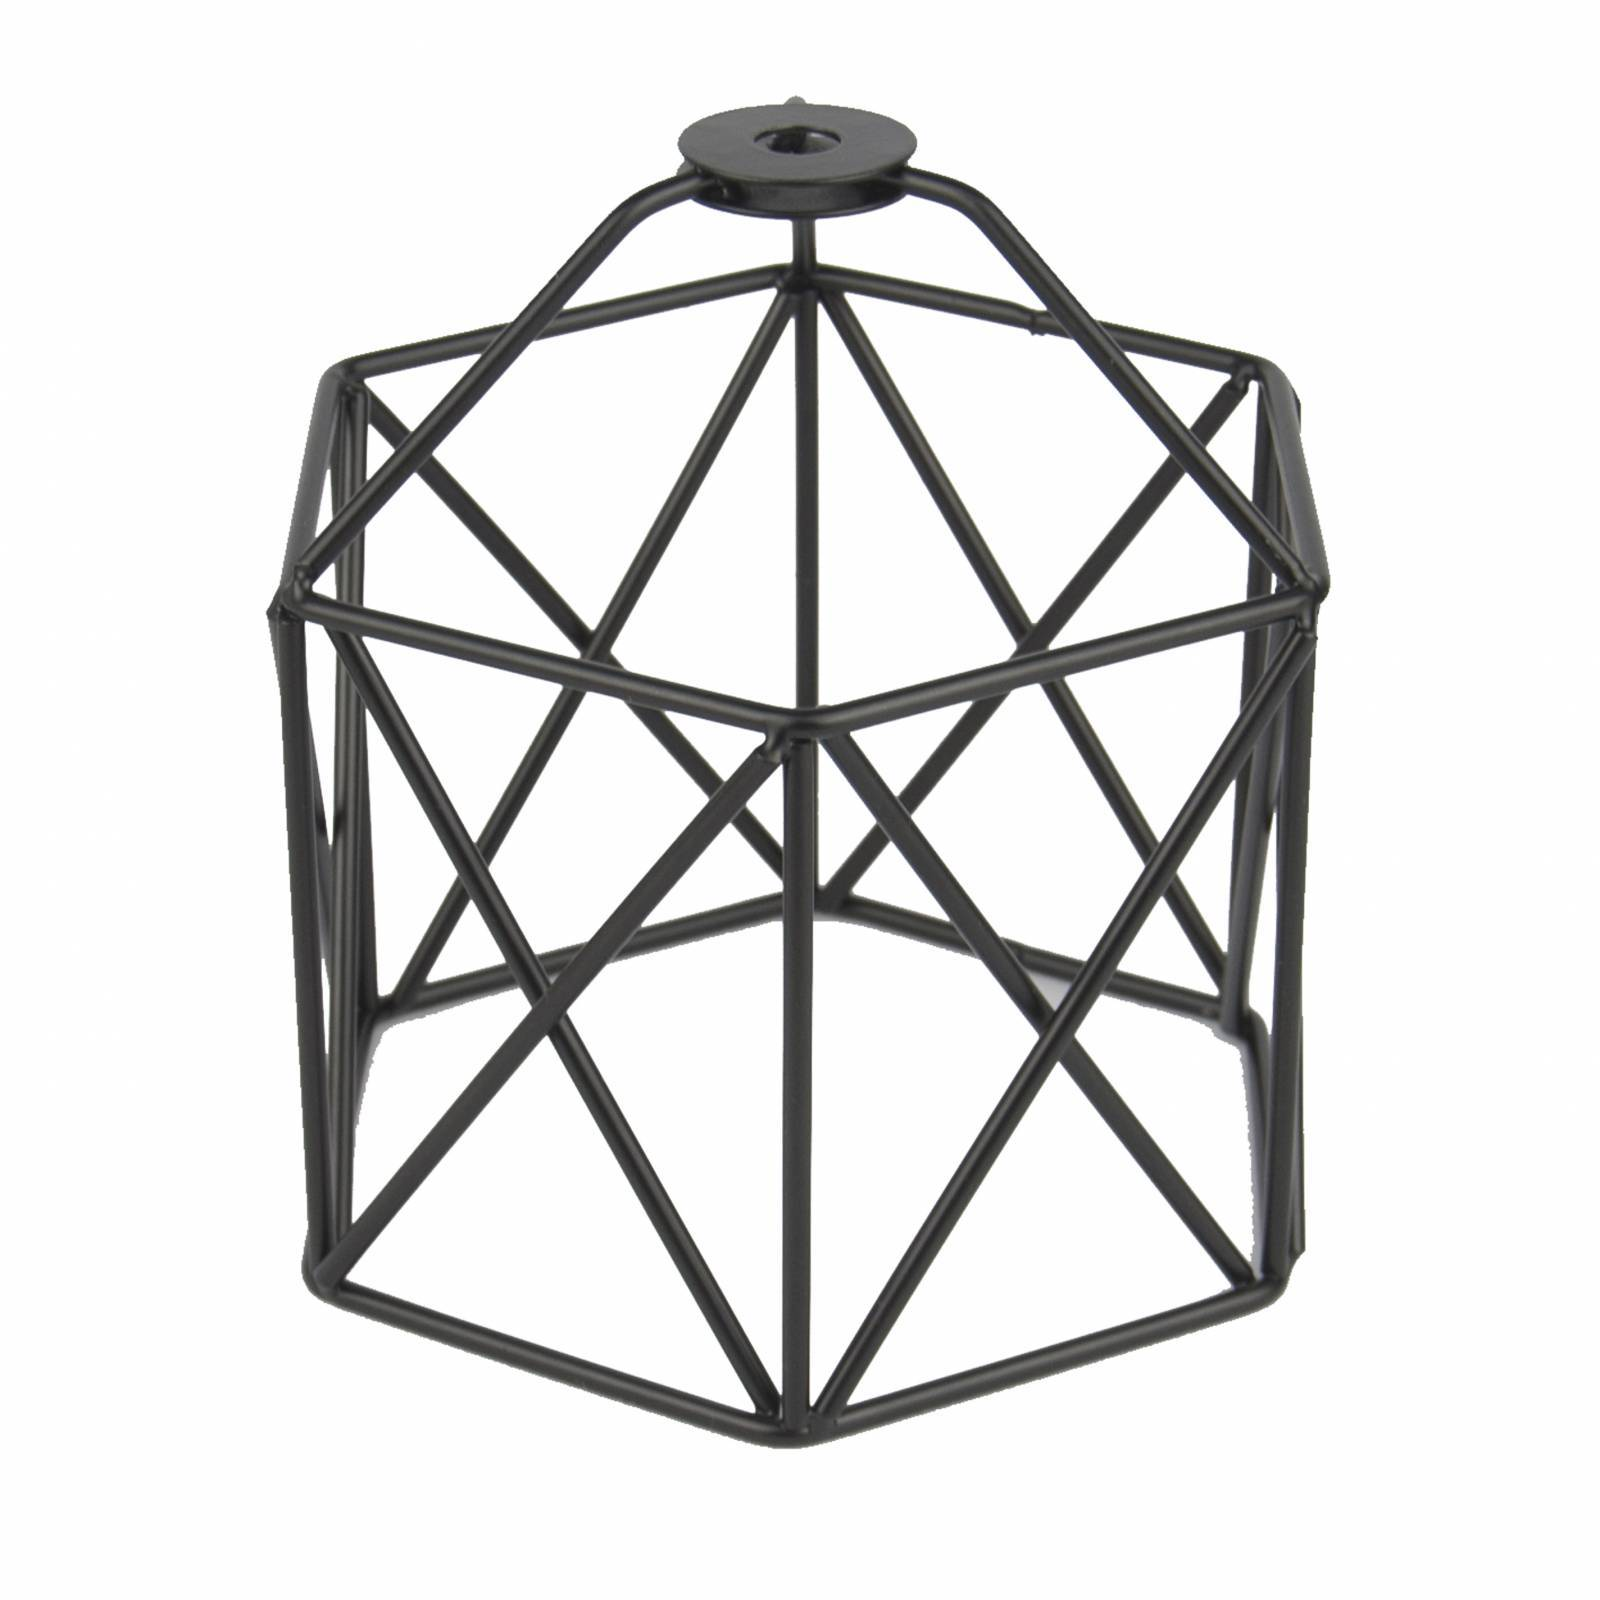 Lustre Pendente Aramado Design Estilo Industrial Preto - LCGELETRO